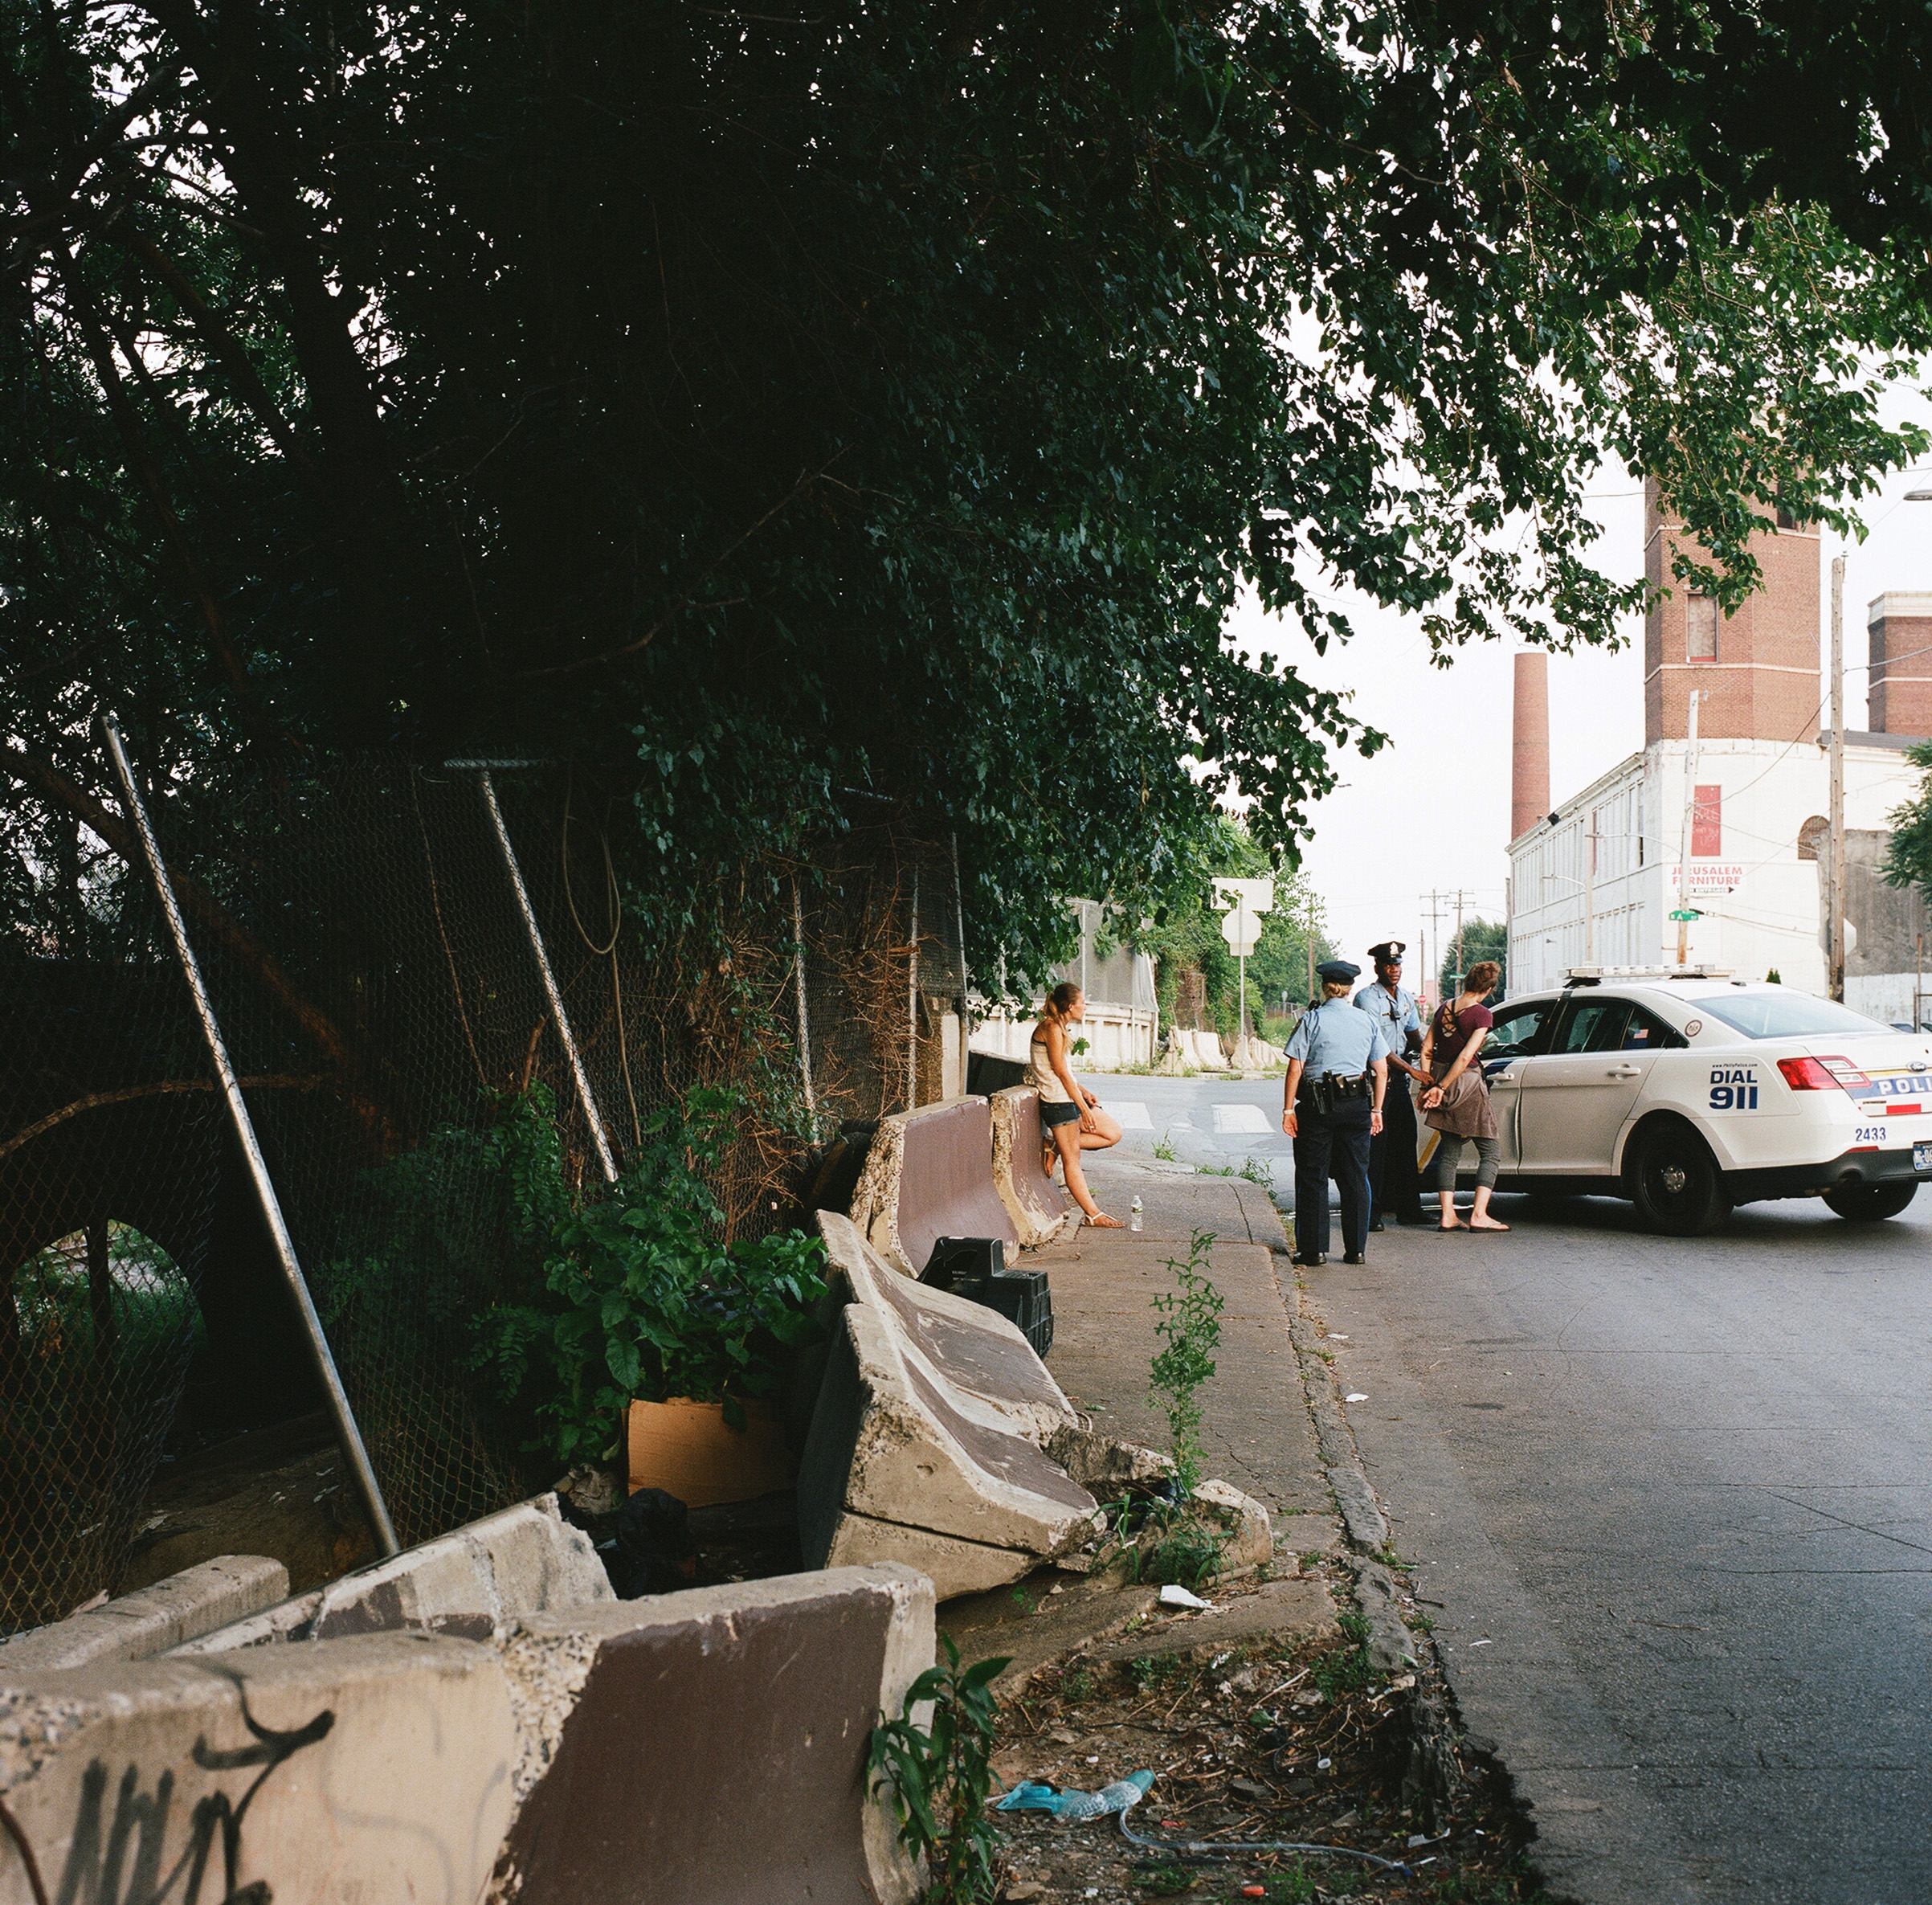 Officers question two women on Gurney Street in Kensington before releasing them.